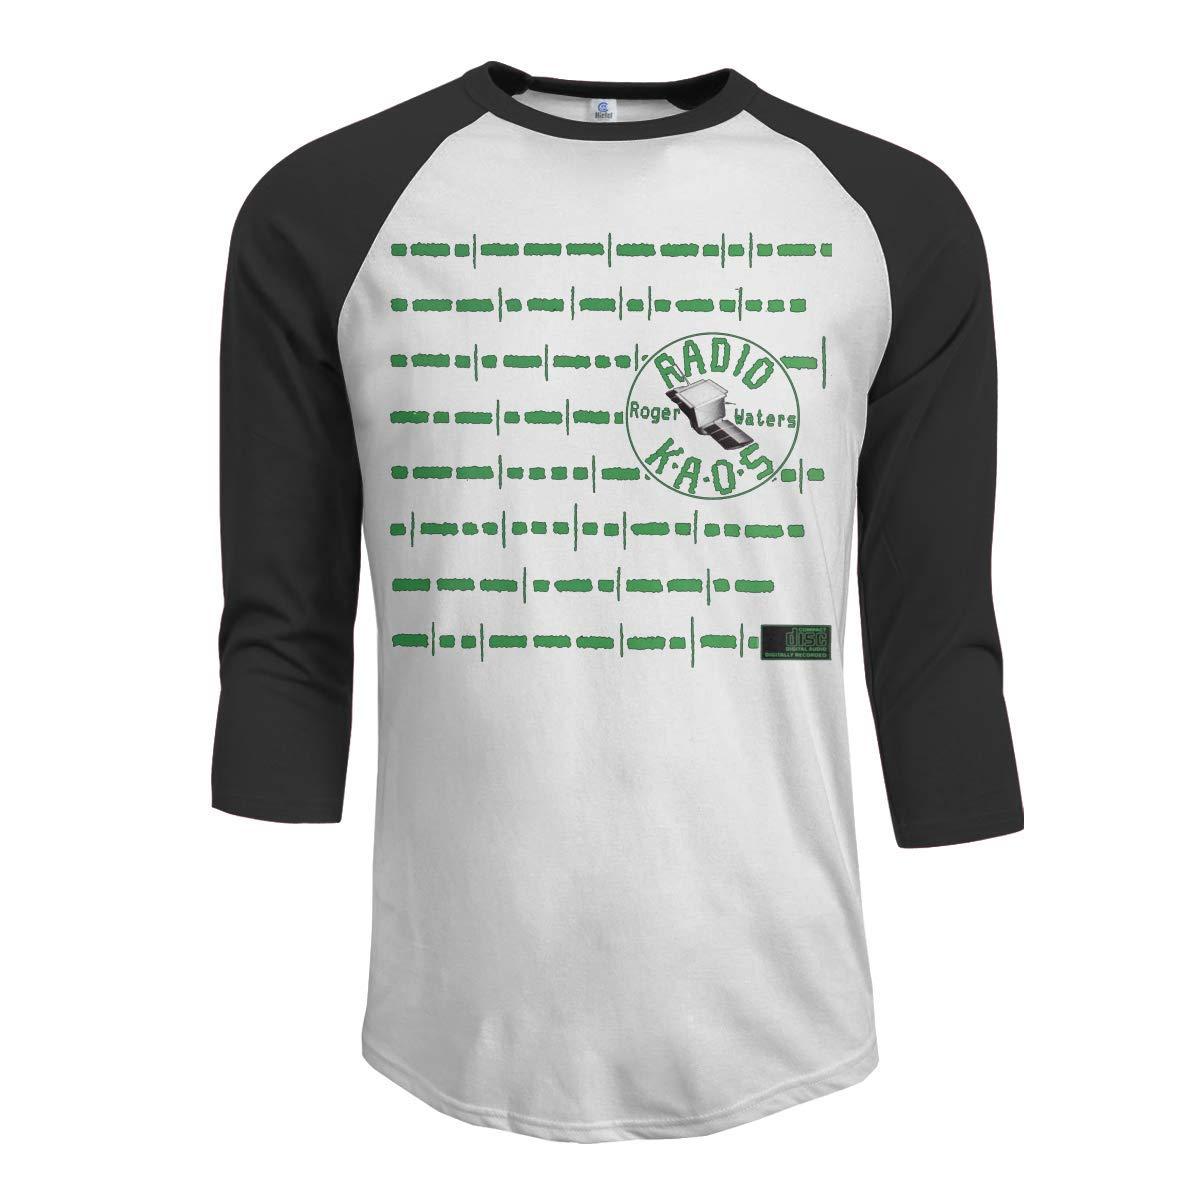 Macwe Roger Waters Radio Kaos Men S 3 4 Sleeve Baseball Black Shirts